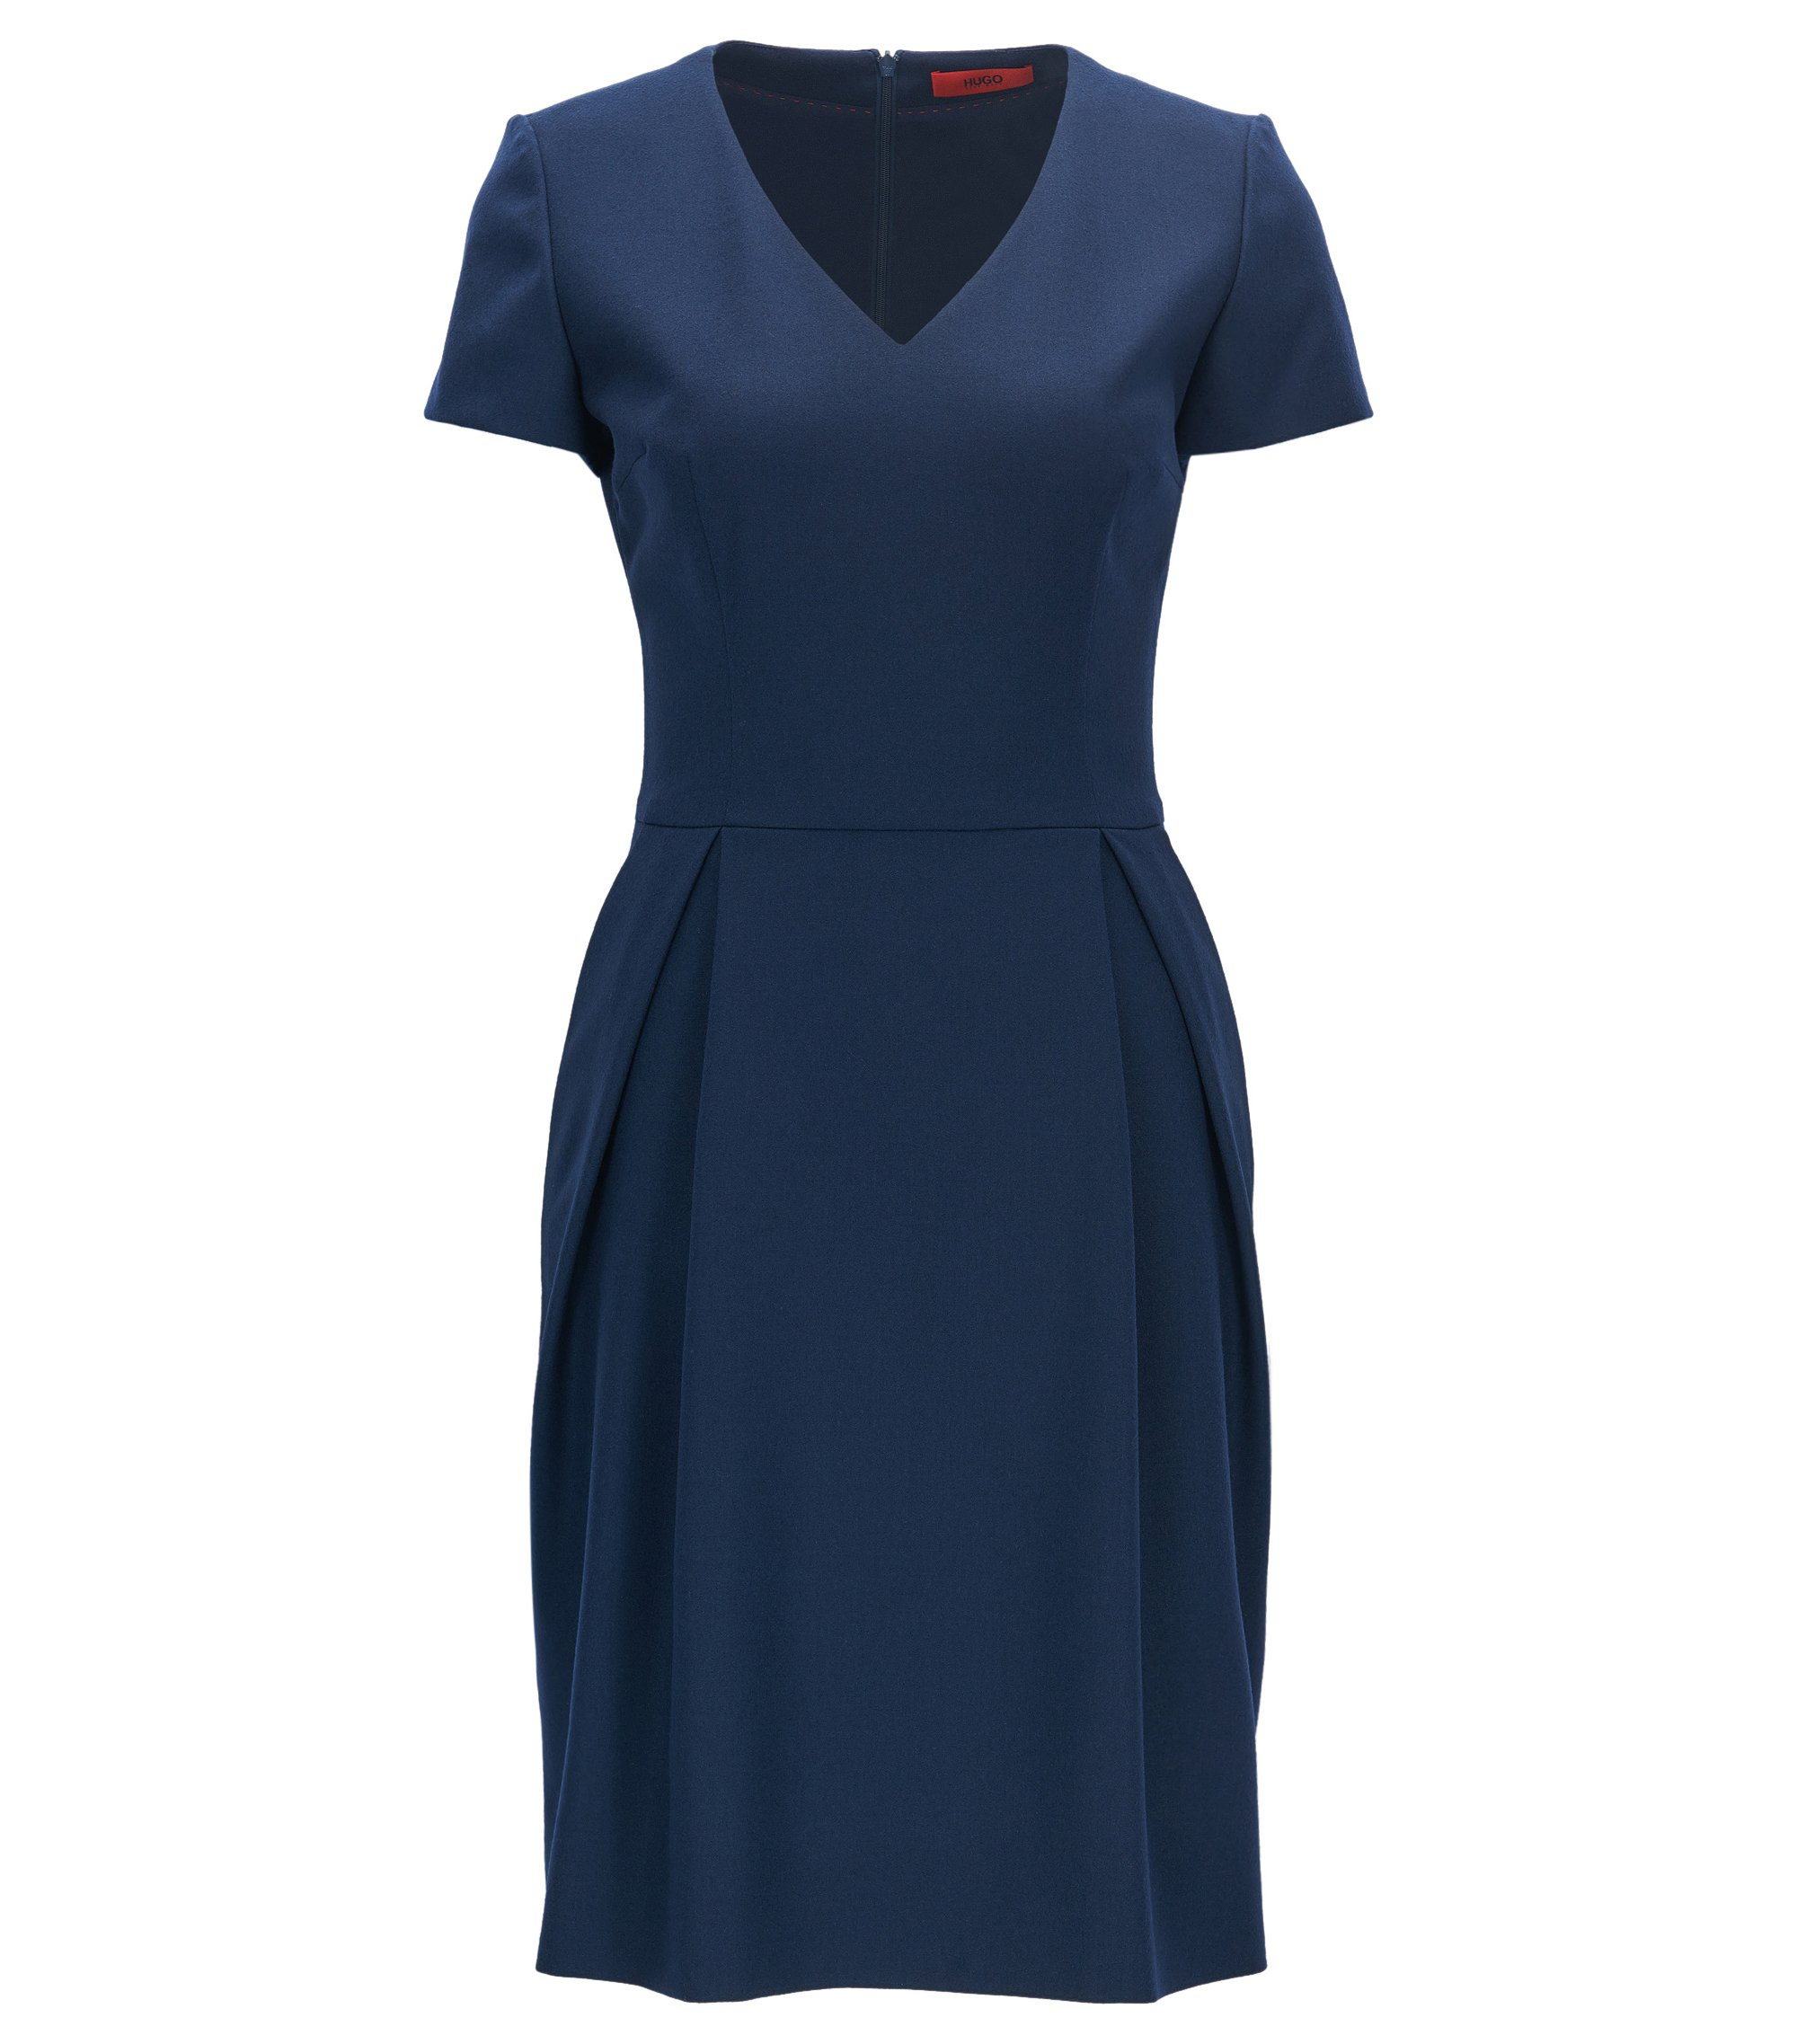 Robe colV en laine vierge stretch, Bleu foncé